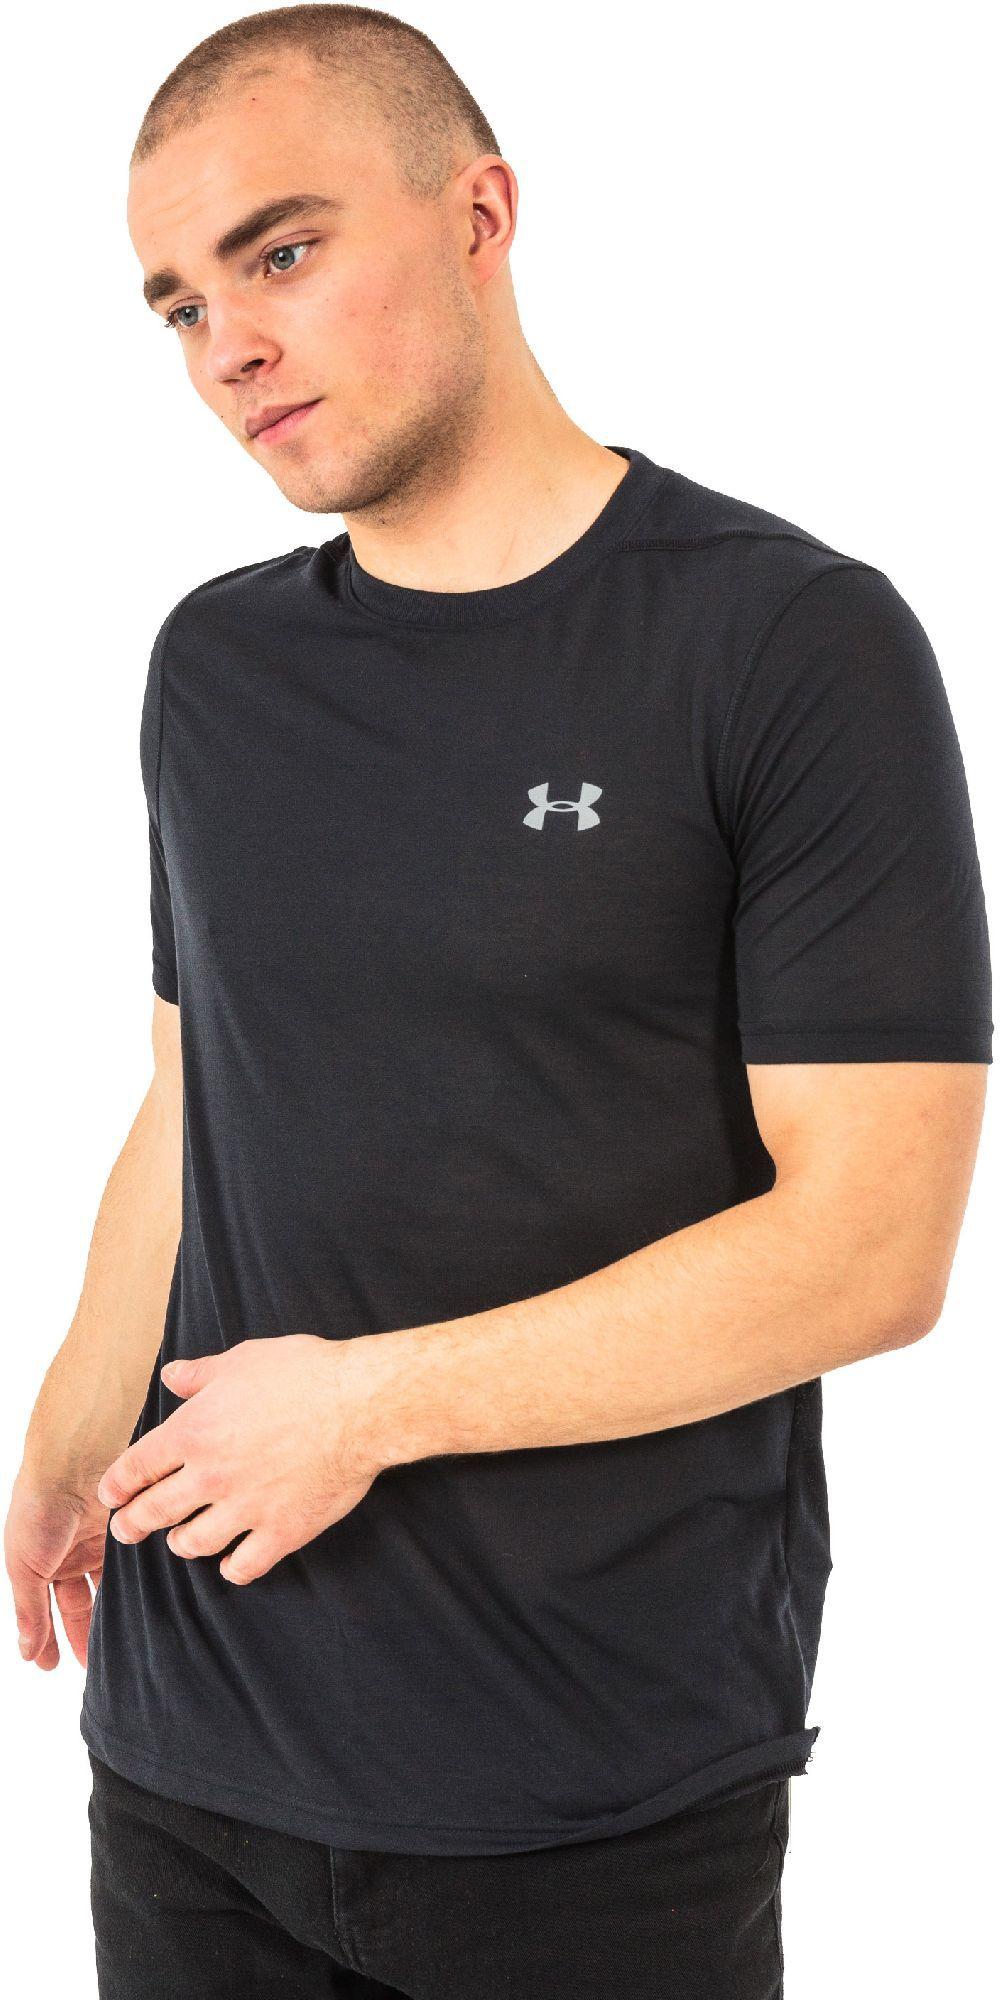 Under Armour Koszulka męska Threadborne T-Shirt Black/Graphite r. XL (1289588001) 1